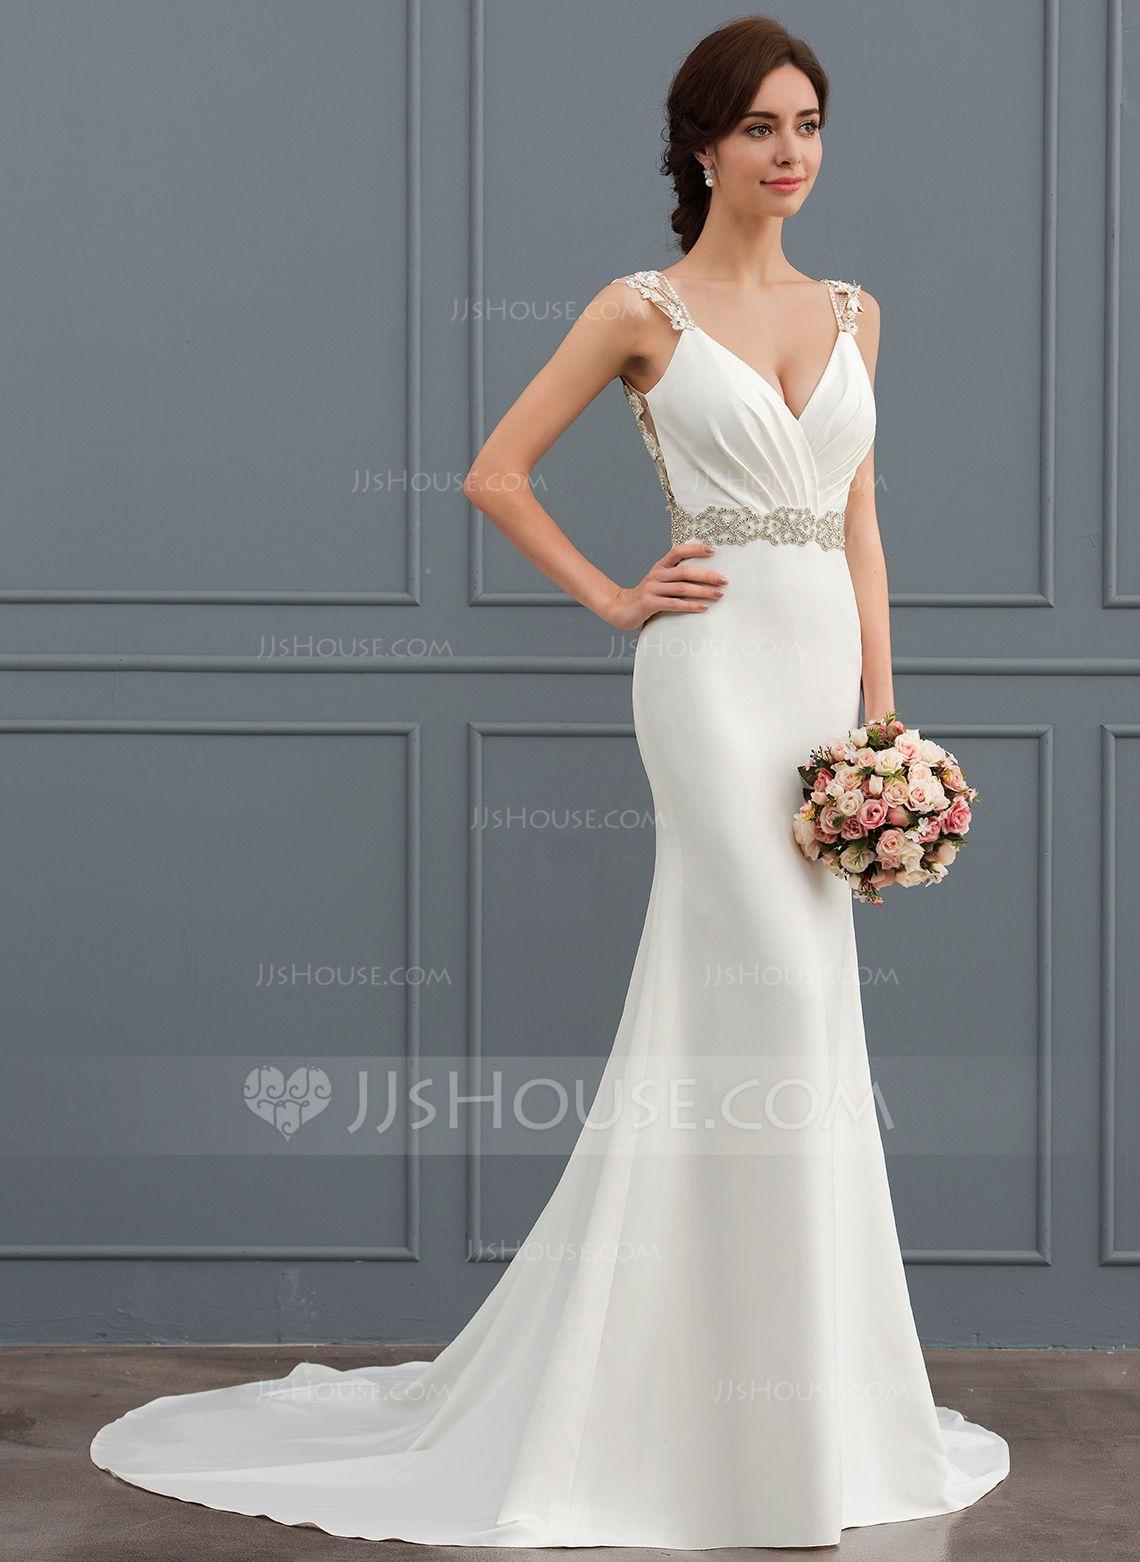 Us 214 00 Trumpet Mermaid V Neck Court Train Stretch Crepe Wedding Dress With Lace Beading Jj S House Wedding Dresses Lace Wedding Dresses Bridal Dresses [ 1562 x 1140 Pixel ]